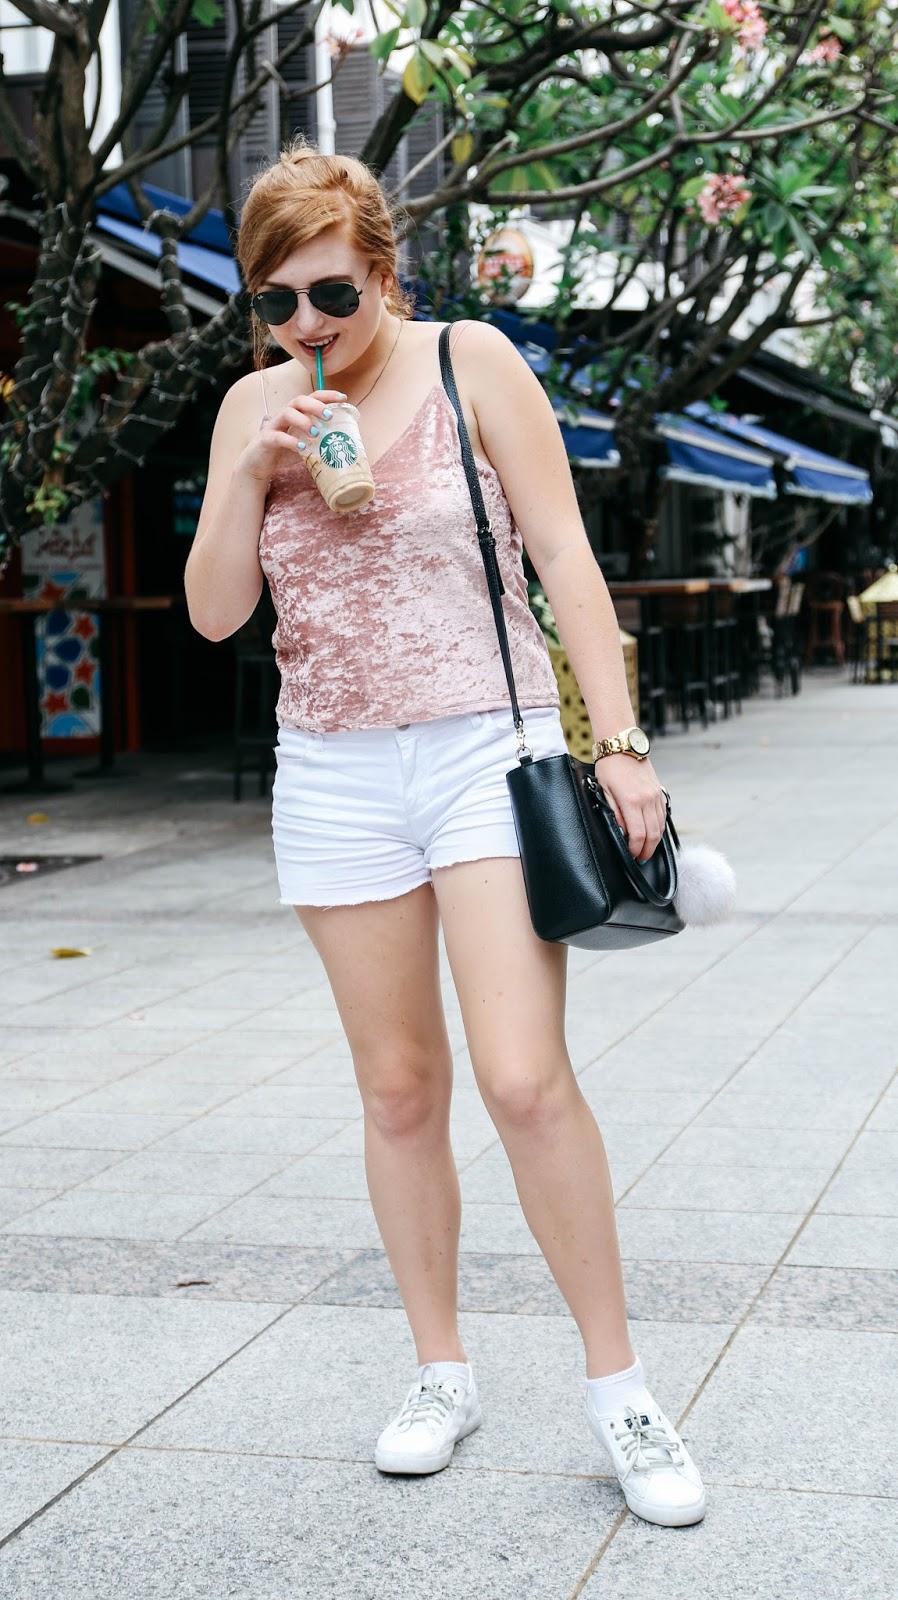 Blush Pink Velvet Top for Valentine's Day | GlobalFashionGal Blog by Brianna Degaston